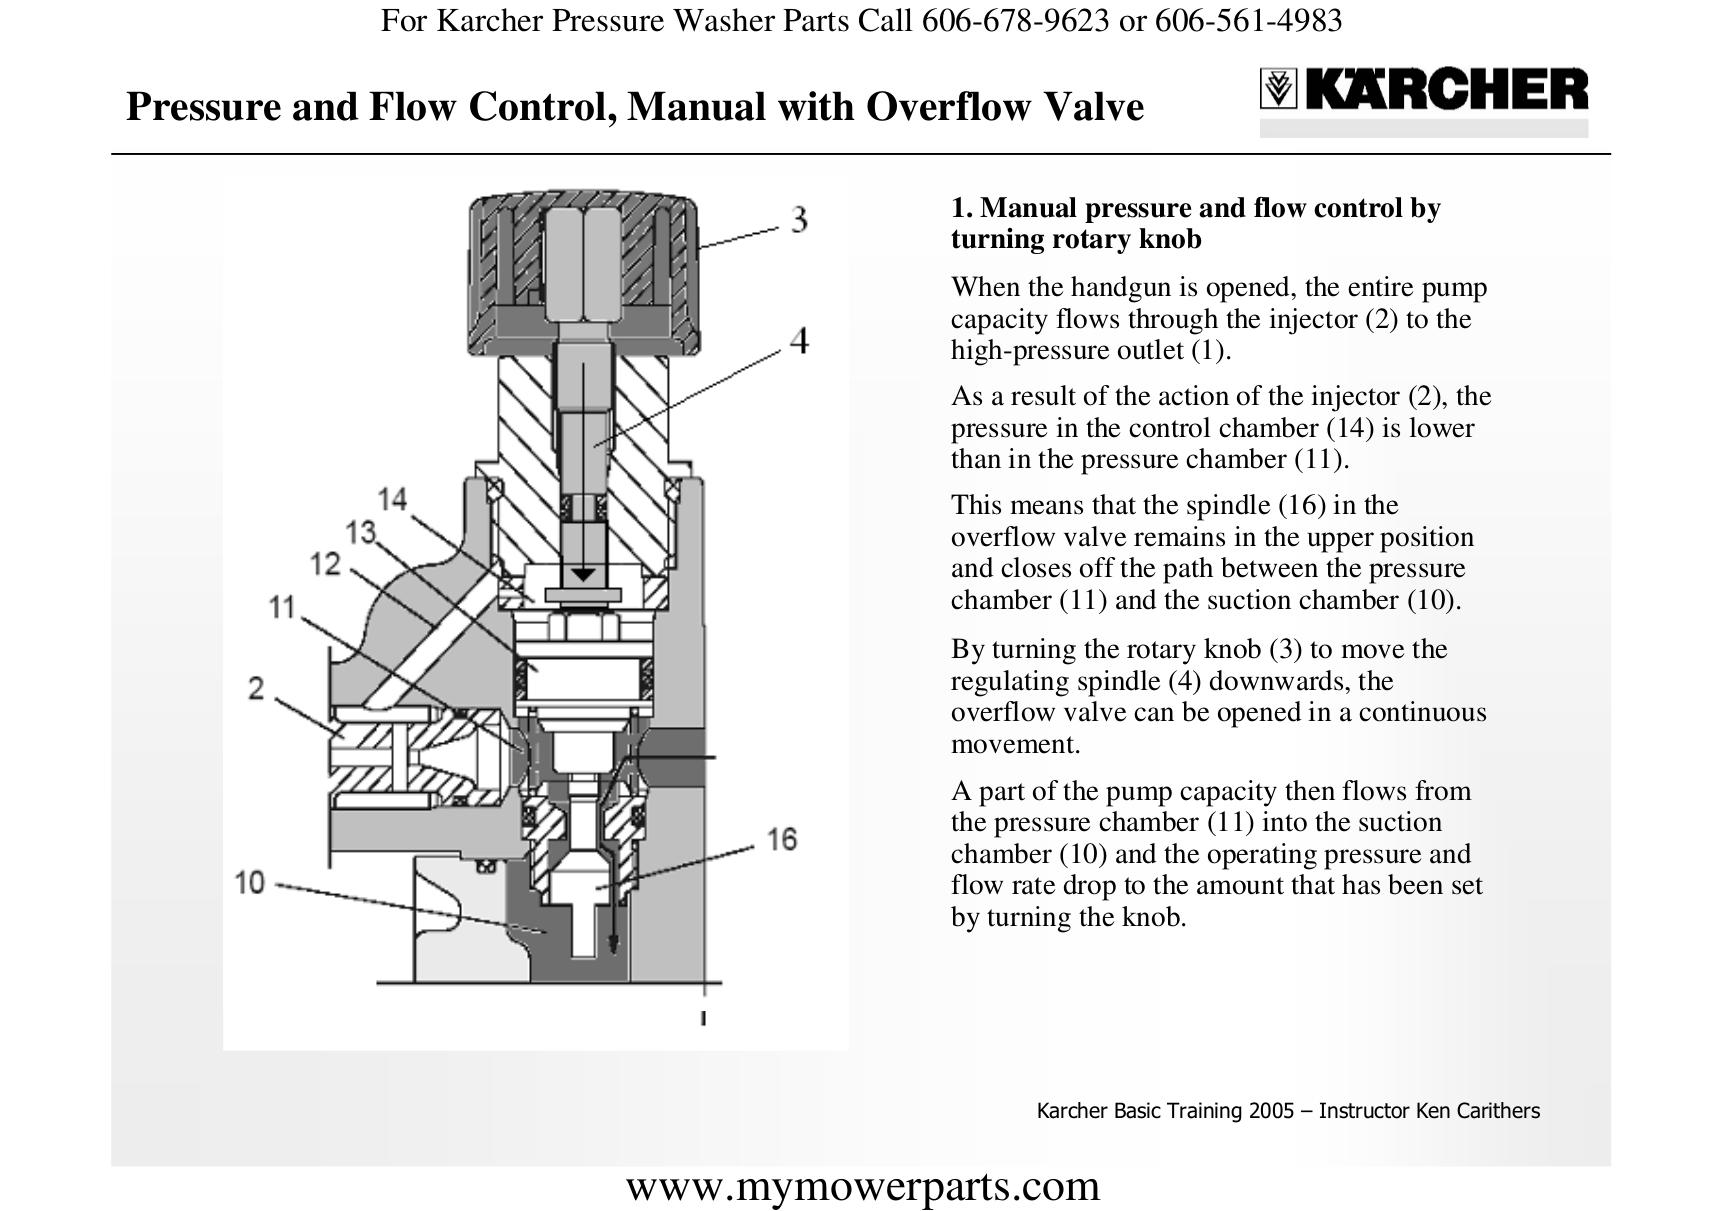 Karcher Hdse 8164m Manual Pdf Download Hds 580 Wiring Diagram For Other K 2400 Hh Pressure Washers